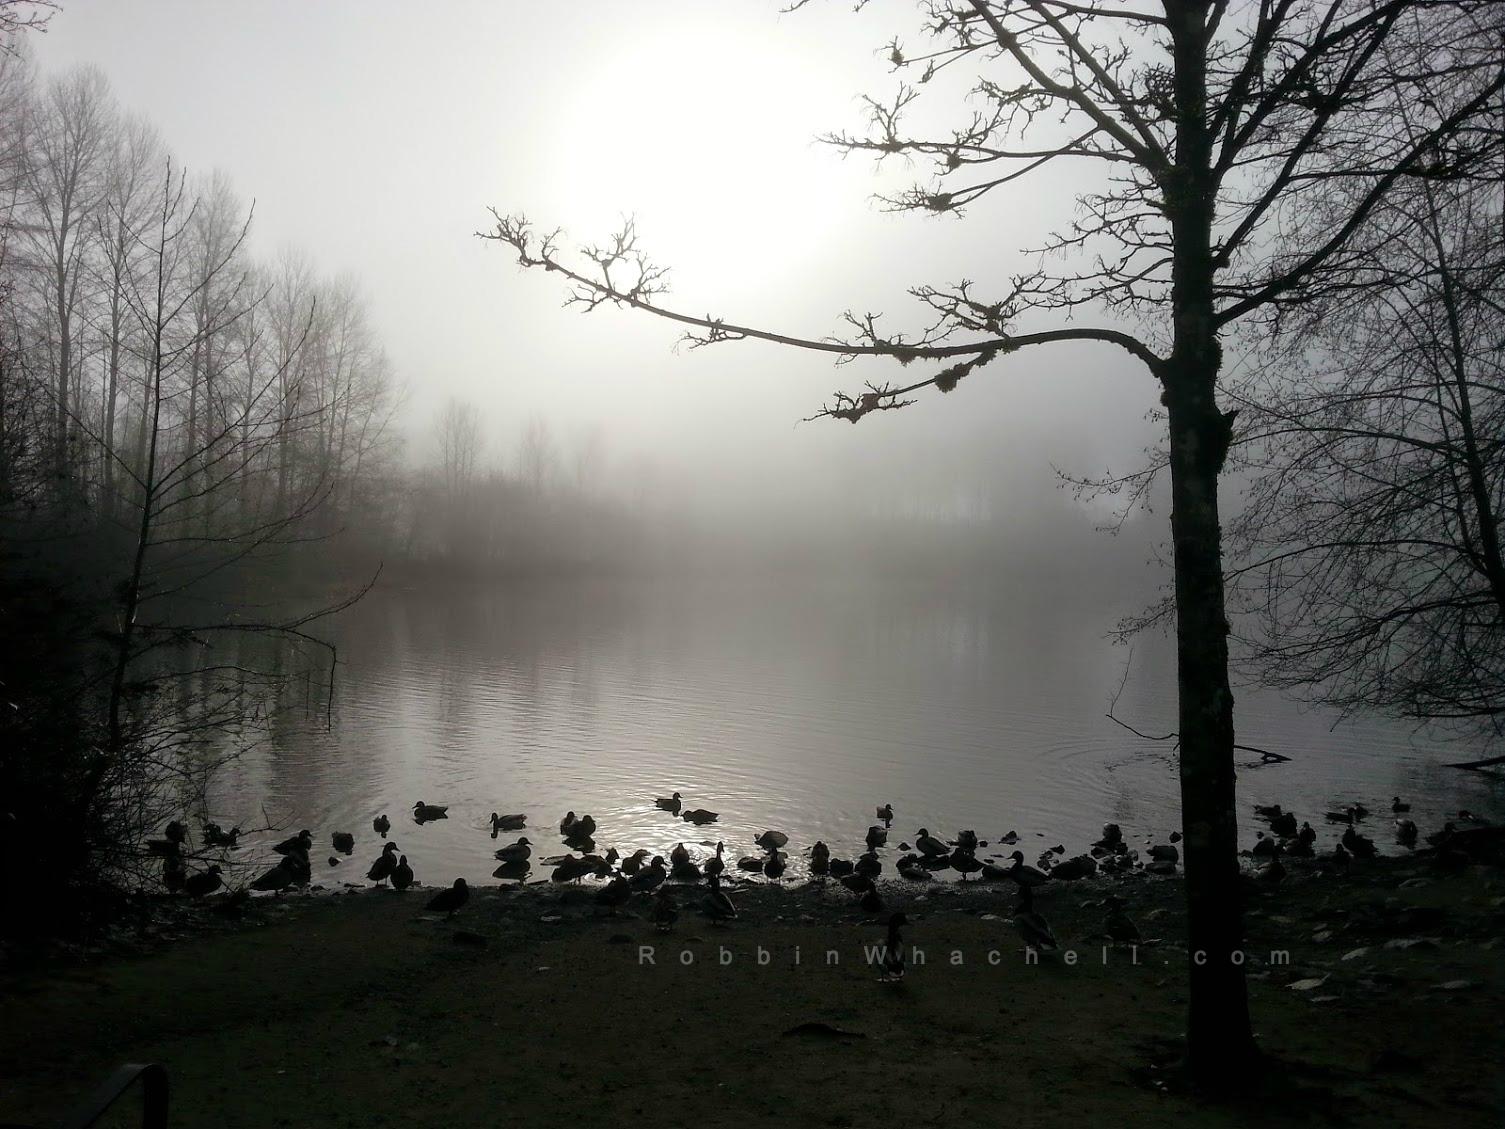 Morning-mist-RW-copyright.jpg